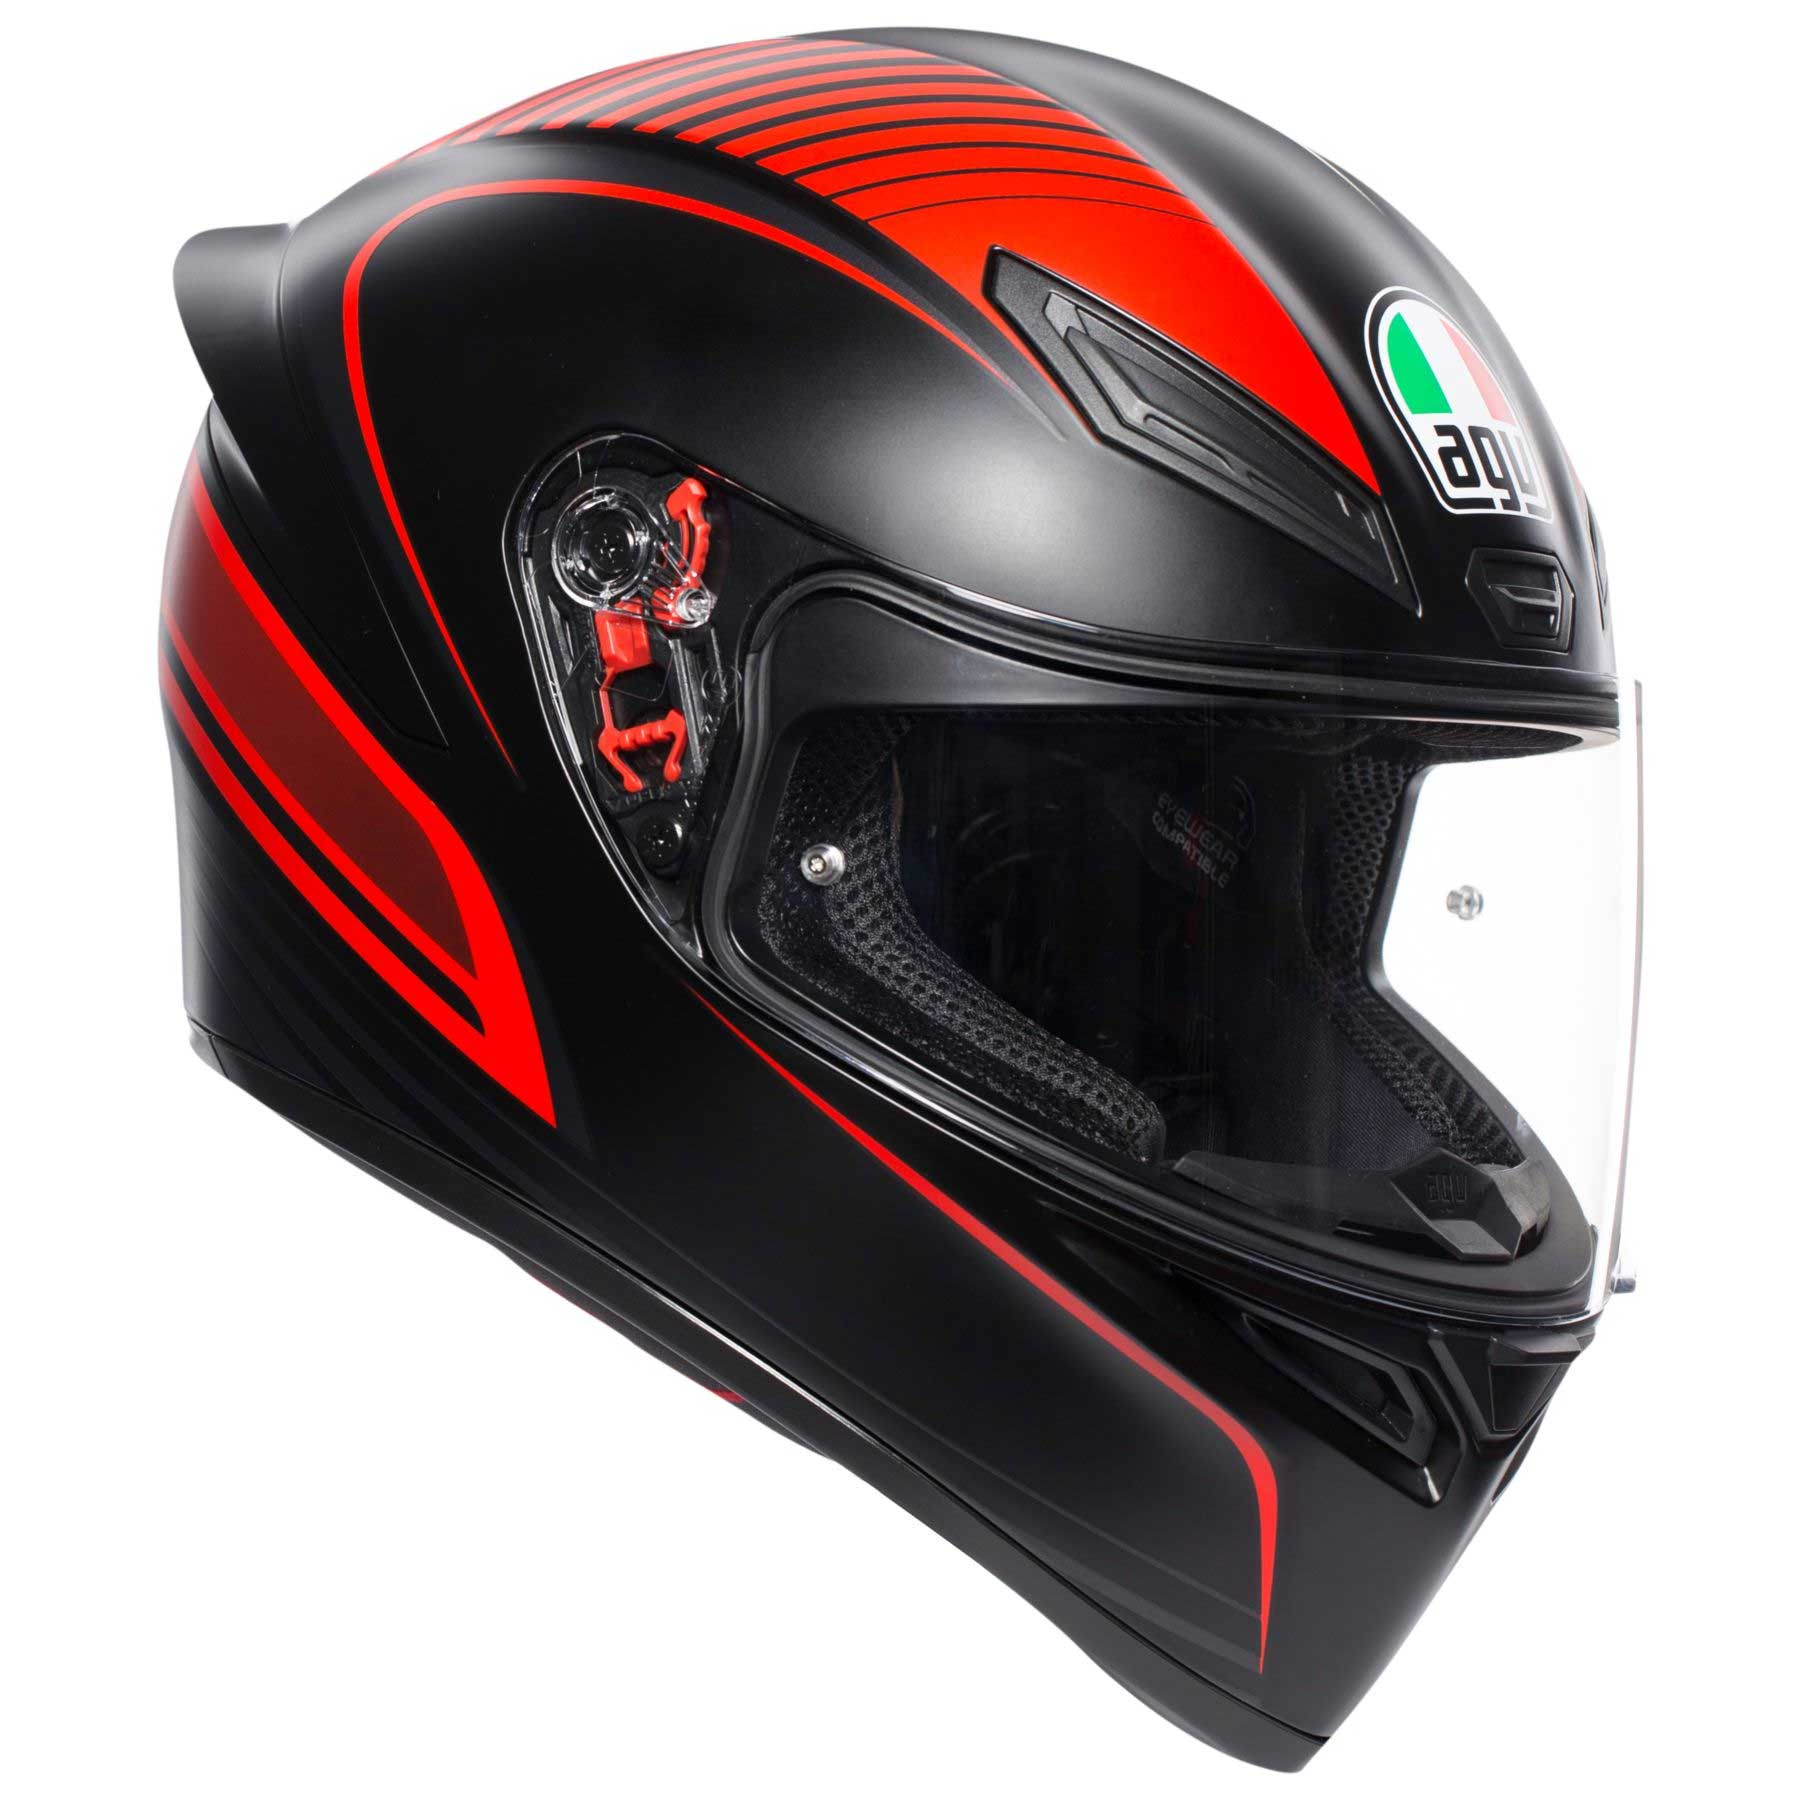 visiera specchio trasparente casco moto agv k1 warmup visiera fume/'